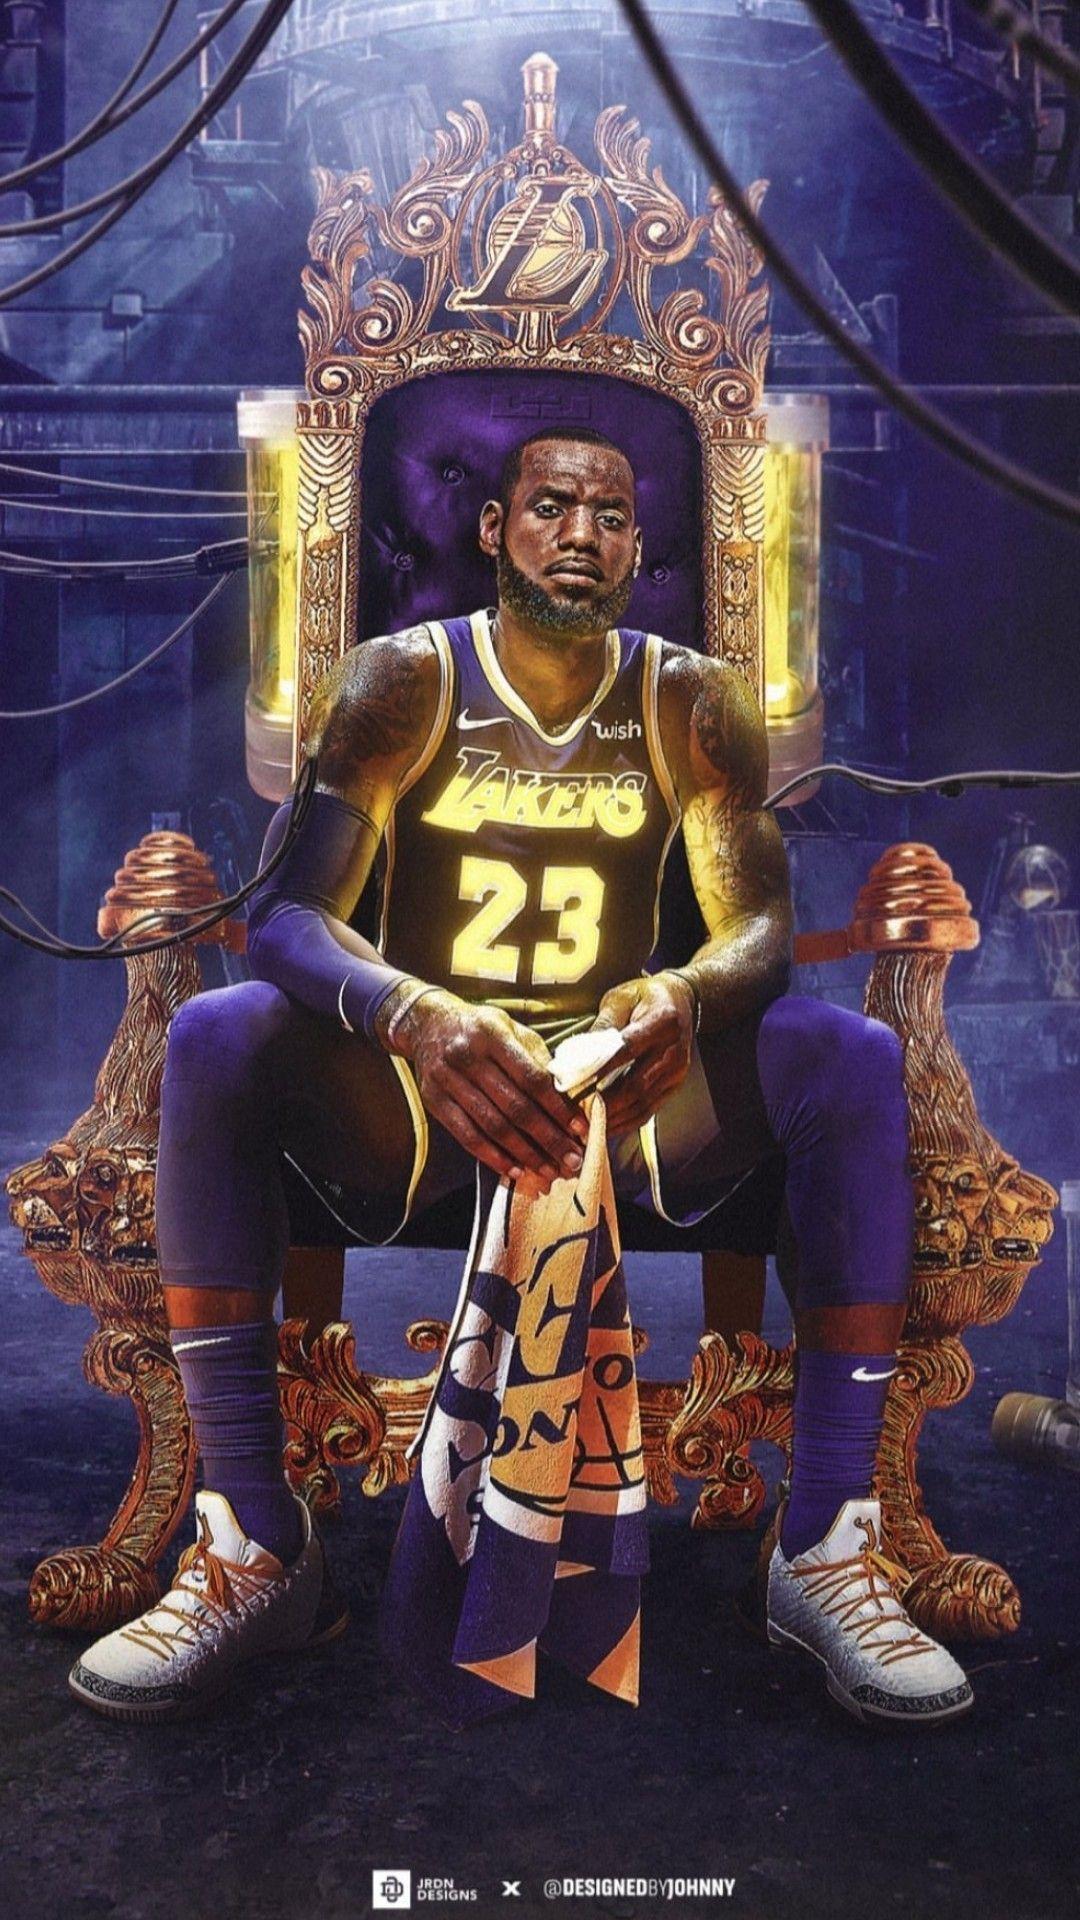 Lebron James Wallpaper Nba Lebron James Wallpaper In 2020 Lebron James Lakers Lebron James Wallpapers Lebron James Basketball